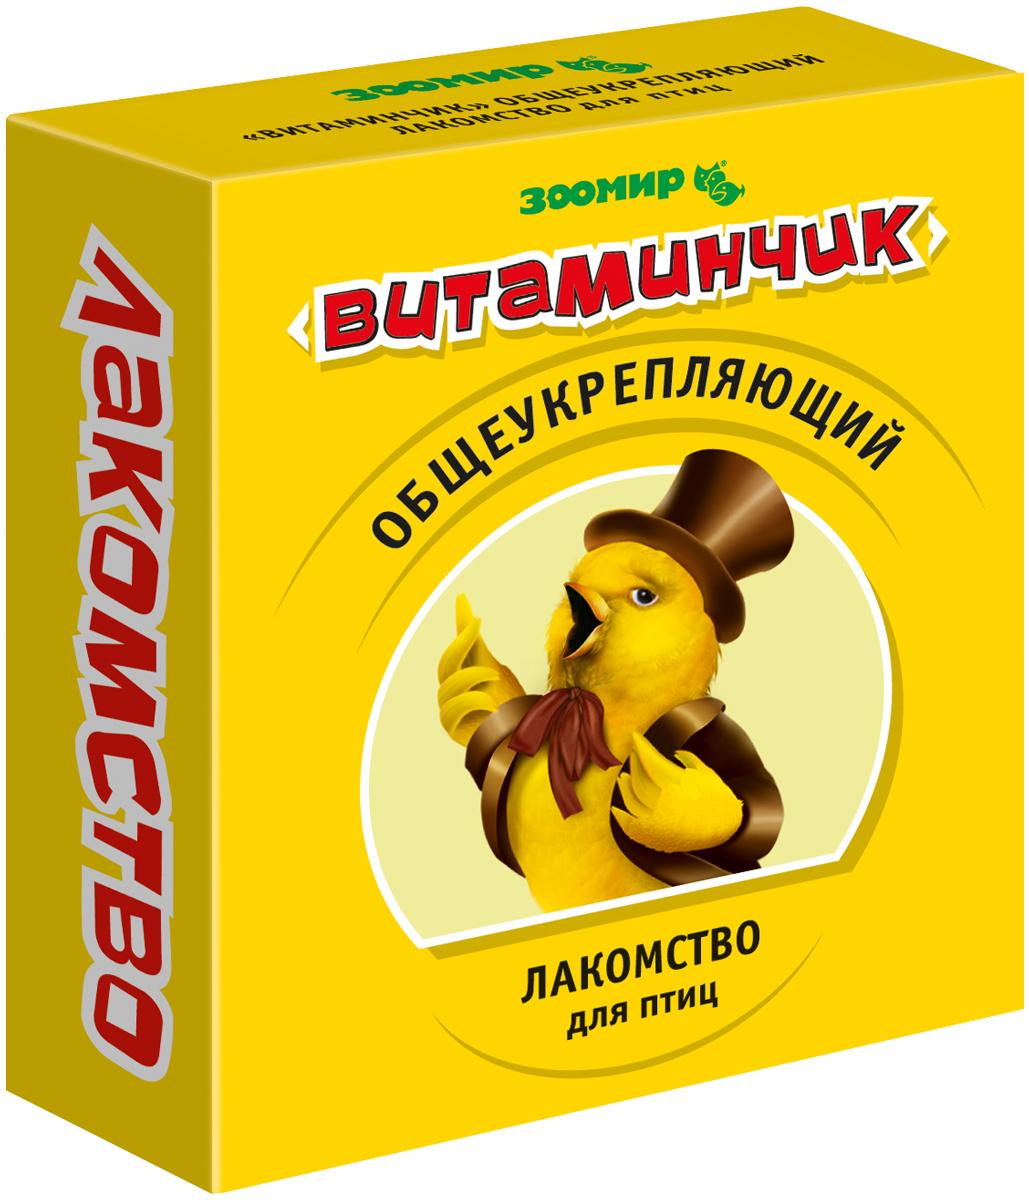 зоомир витаминчик лакомство для птиц общеукрепляющее 50 гр (1 шт)